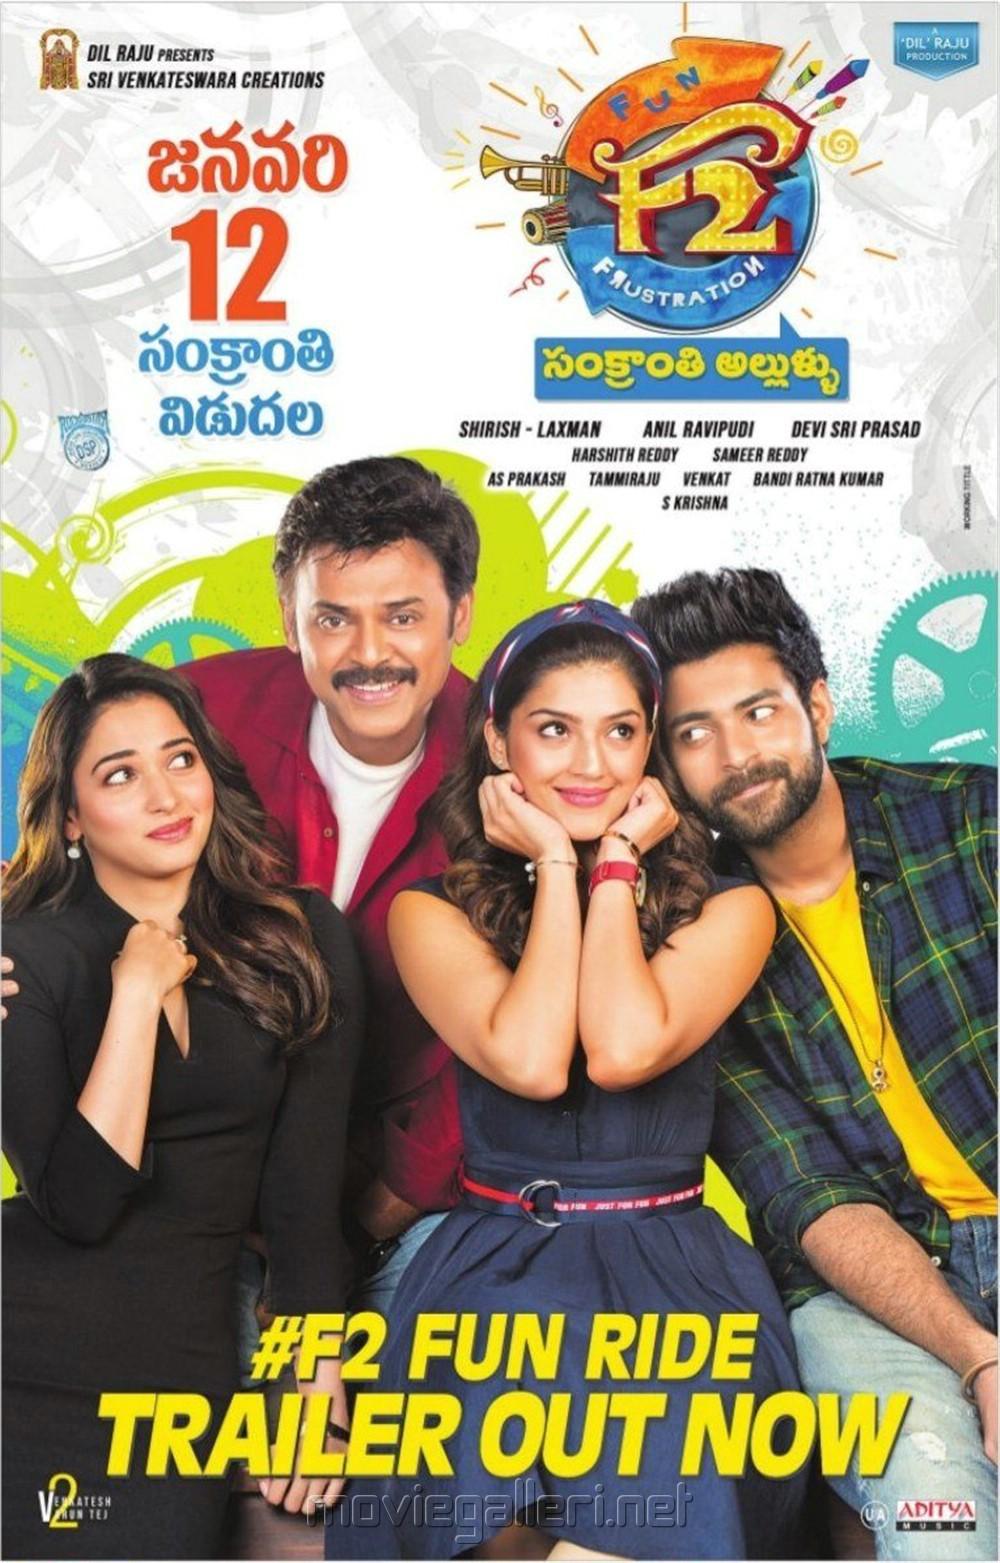 F2 Fun and Frustration 2019 Telugu Proper 720p HDRip x264 1.4GB